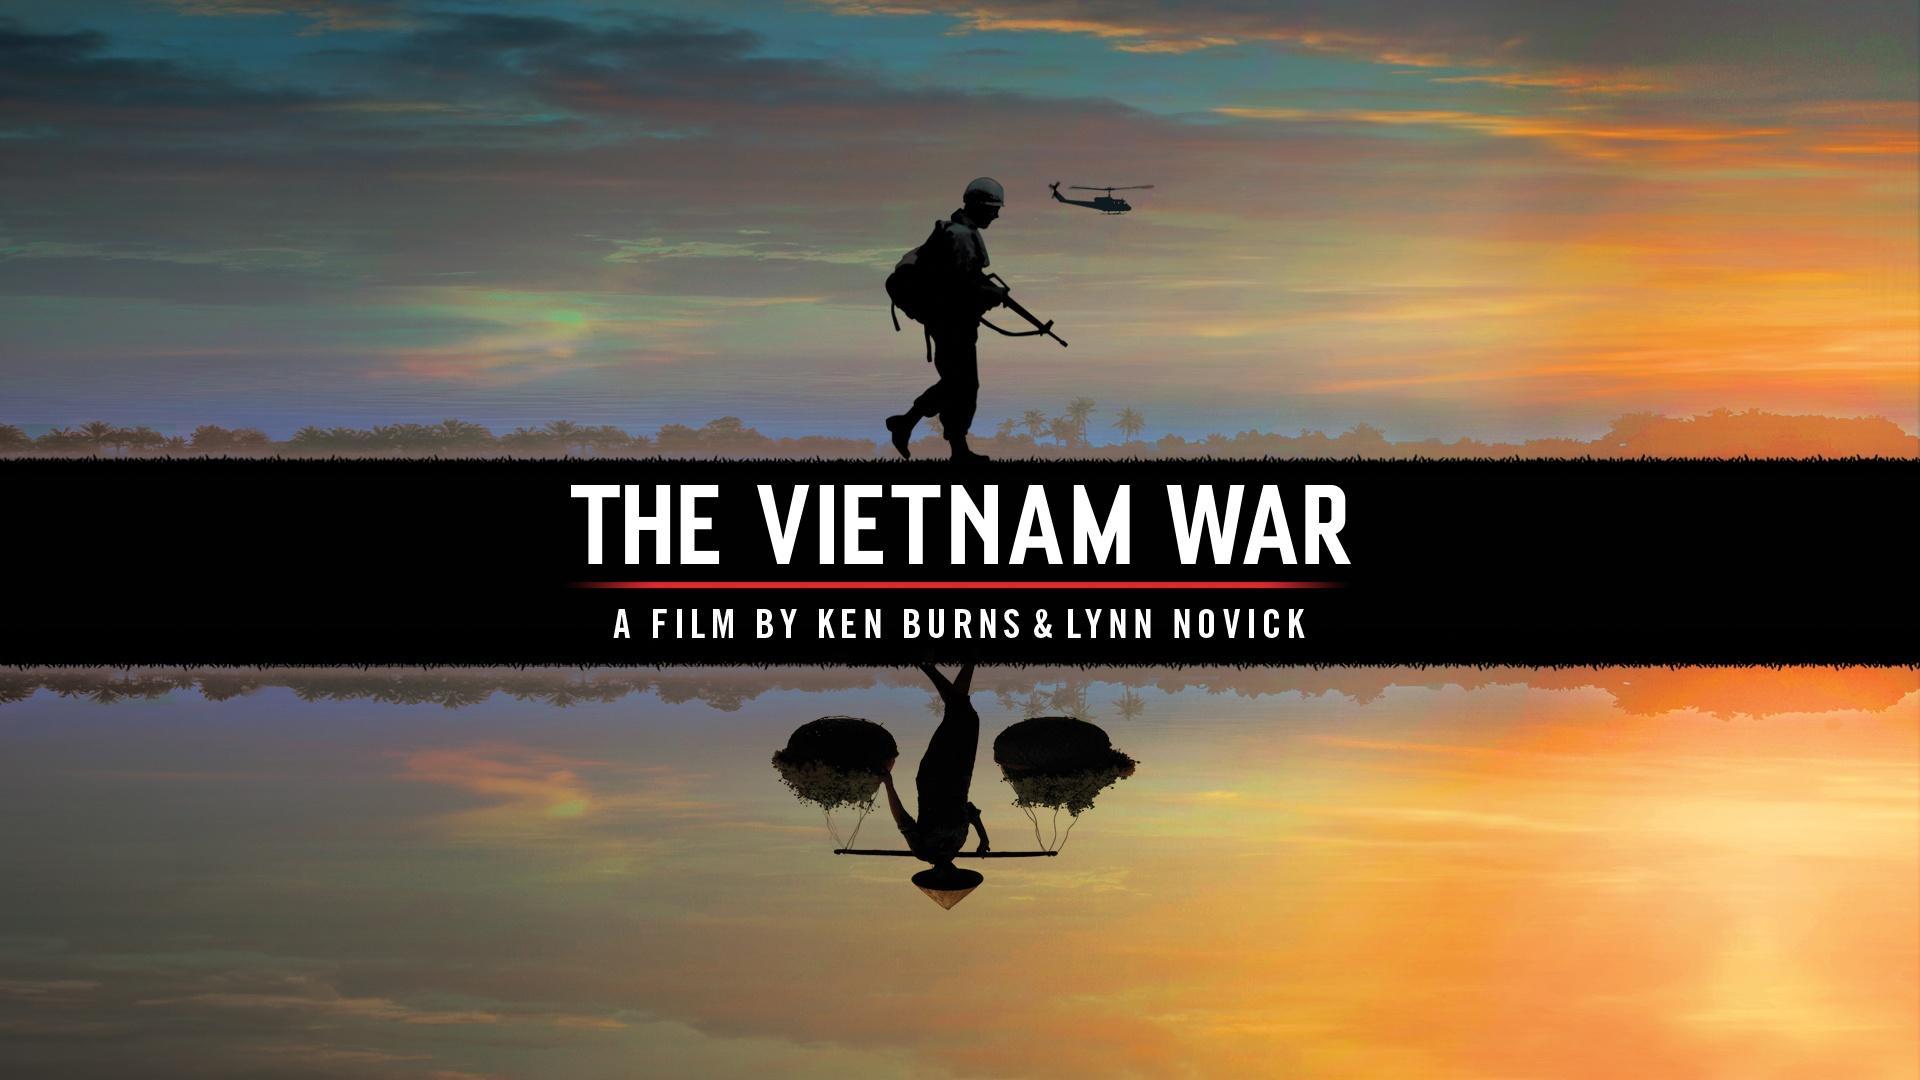 The Vietnam War A Film by Ken Burns and Lynn Novick